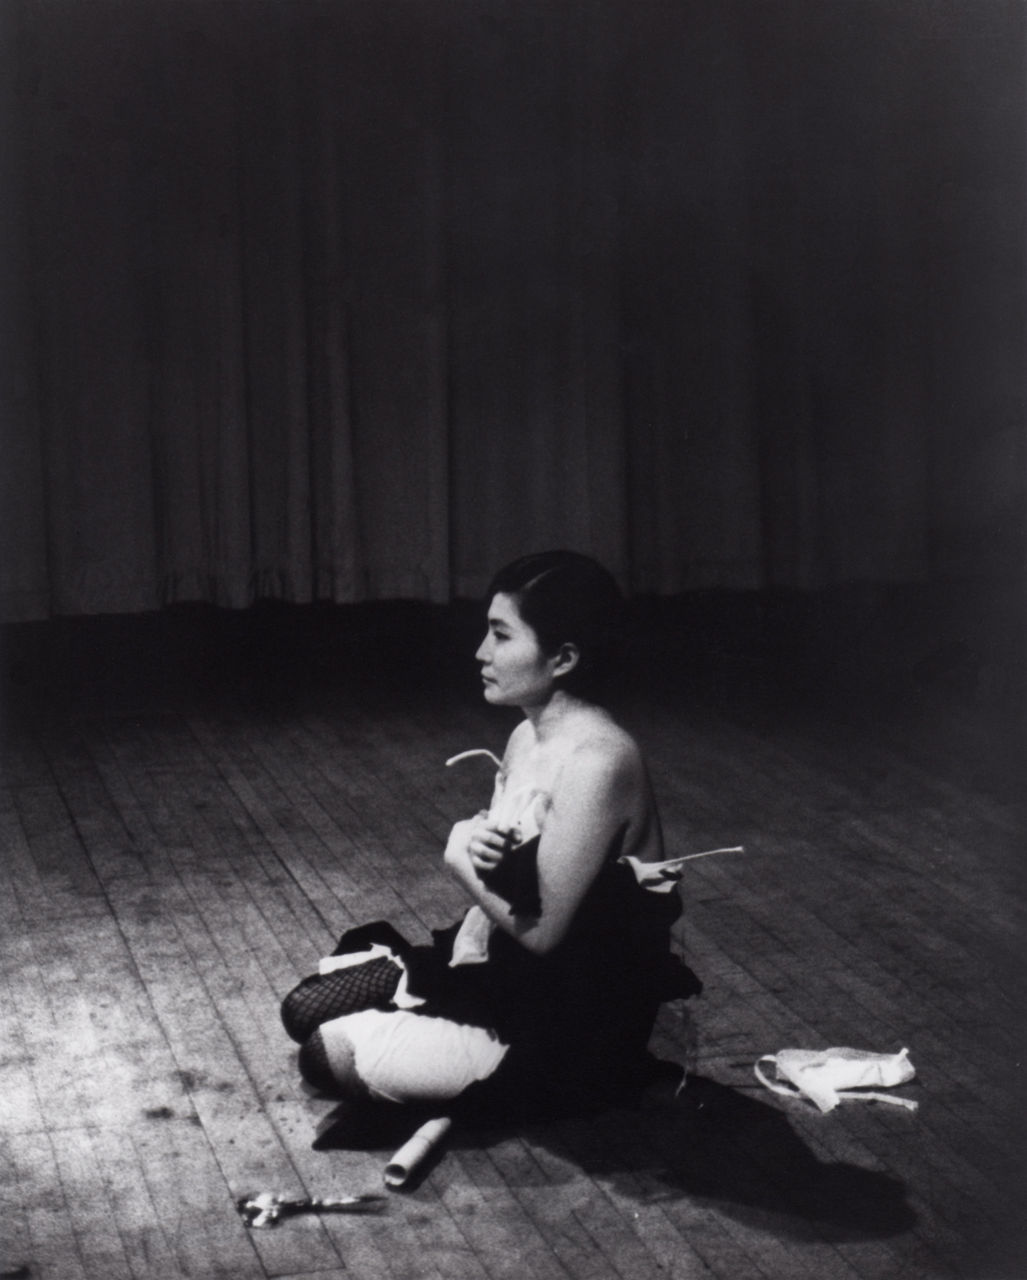 Yoko Ono: One Woman Show, 1960-1971 at MoMA New York